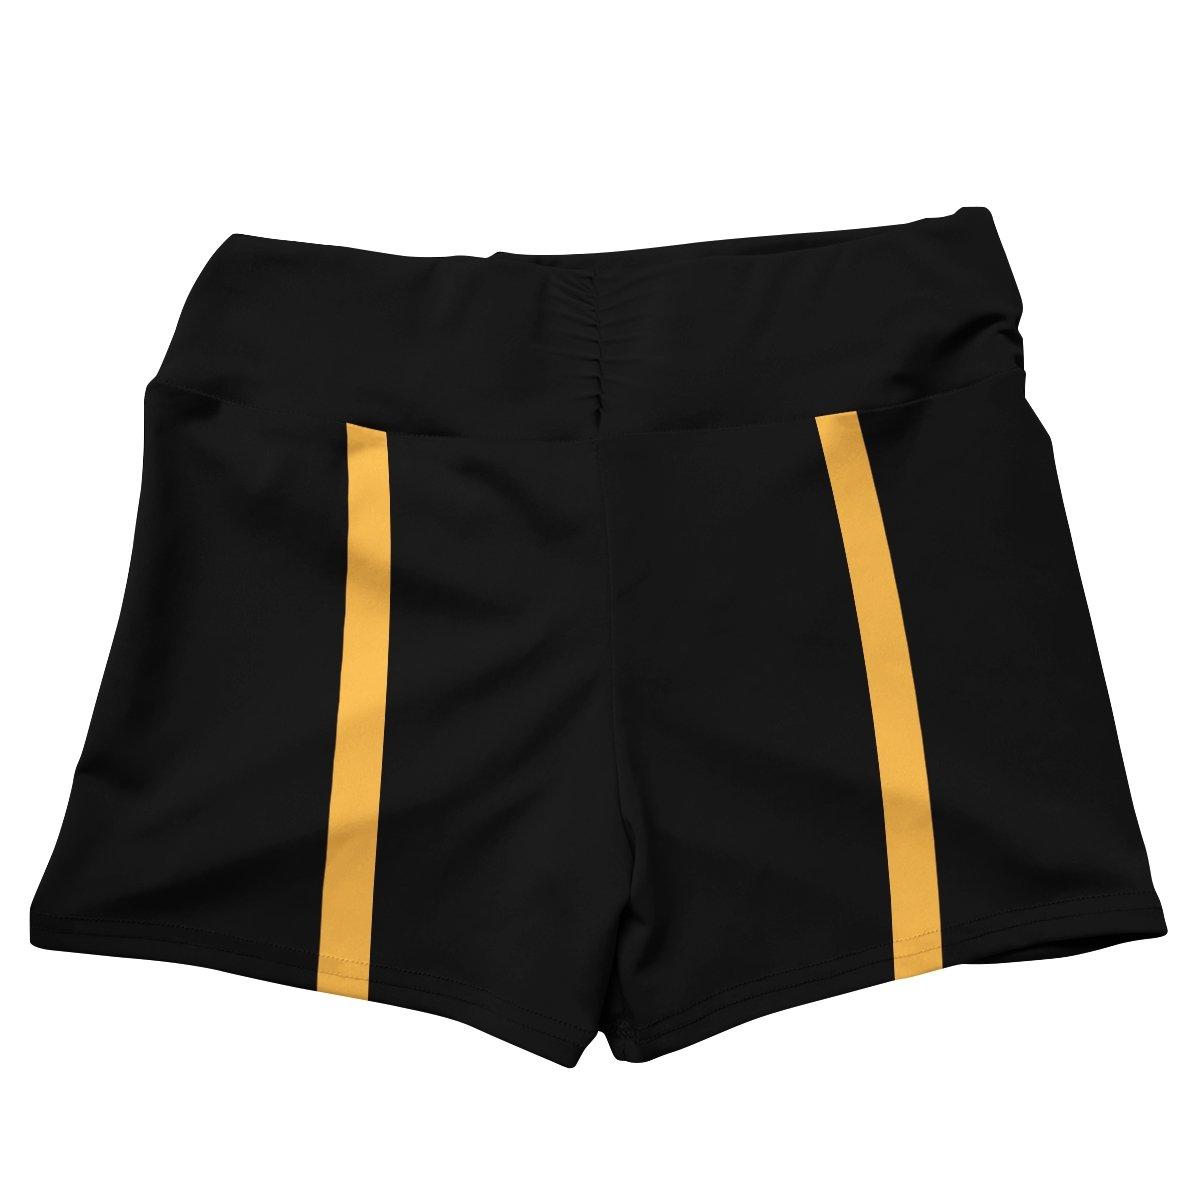 re zero subaru natsuki active wear set 556254 - Anime Swimsuits